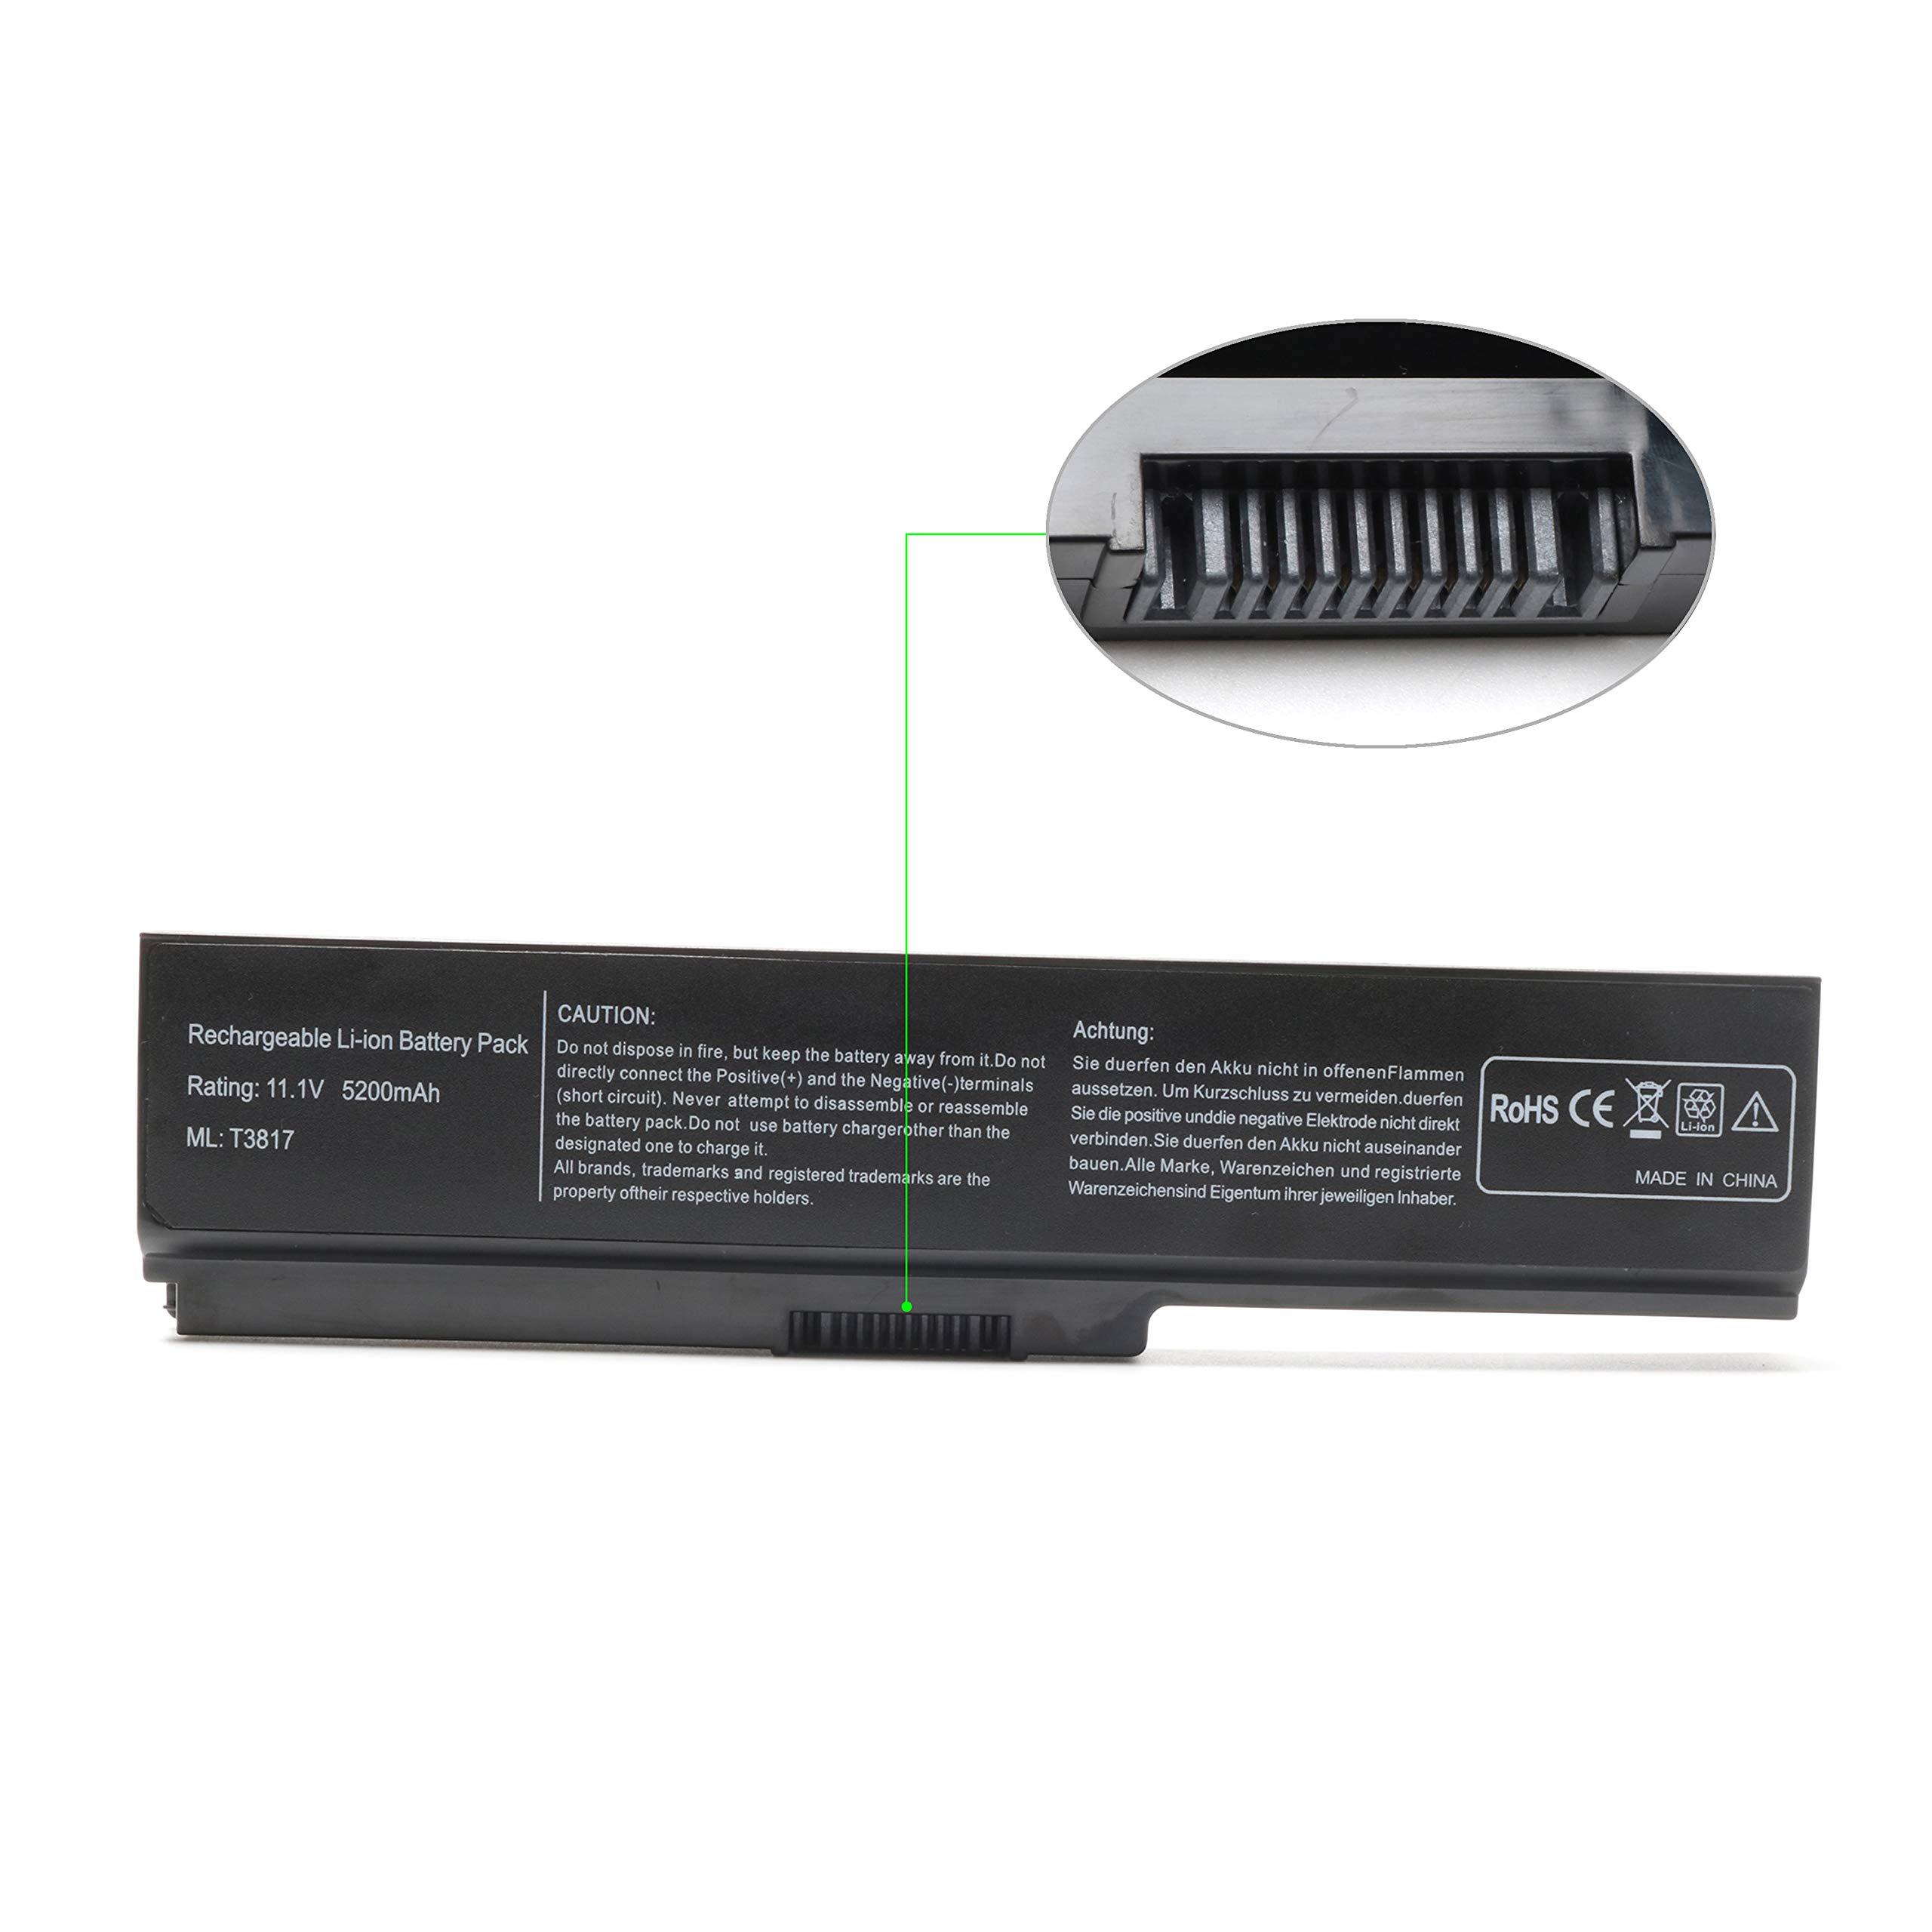 Bateria para Toshiba PA3817U-1BRS PA3818U-1BRS PA3819U-1BRS Toshiba Satellite C655 L755 L655 P755 A665 A665-S6050 L745 C